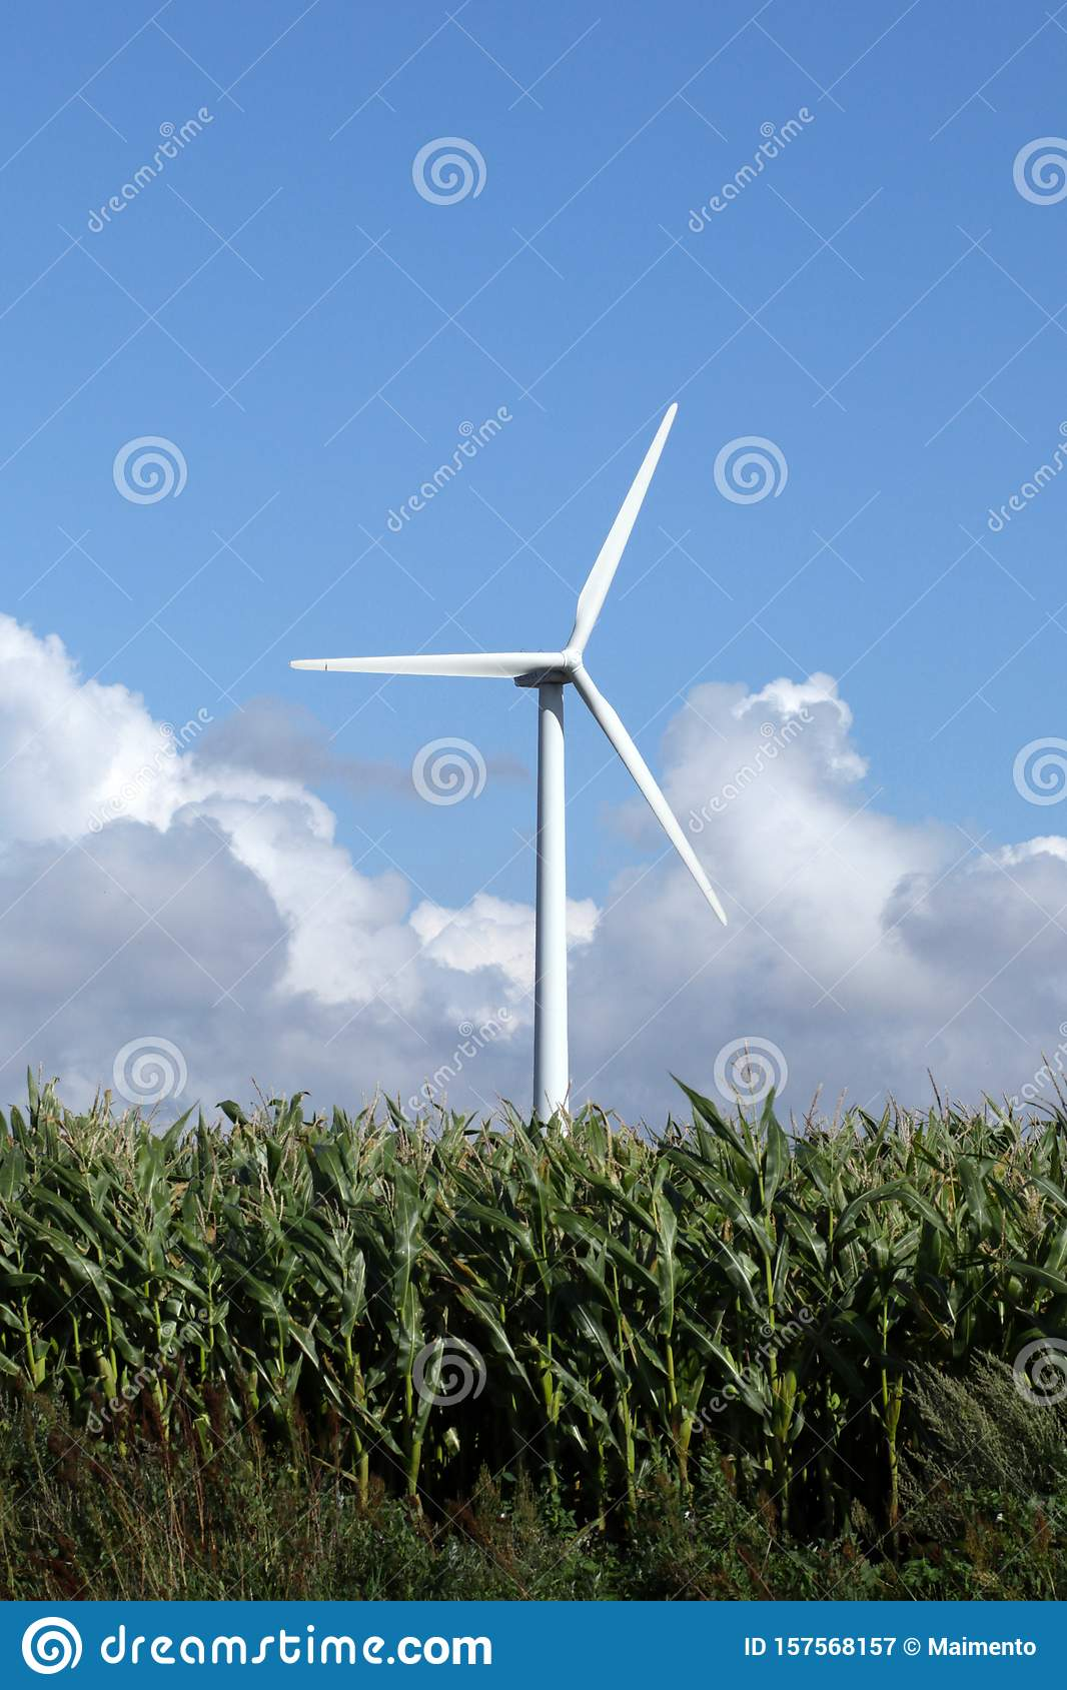 Single white wind turbine in corn field standing high